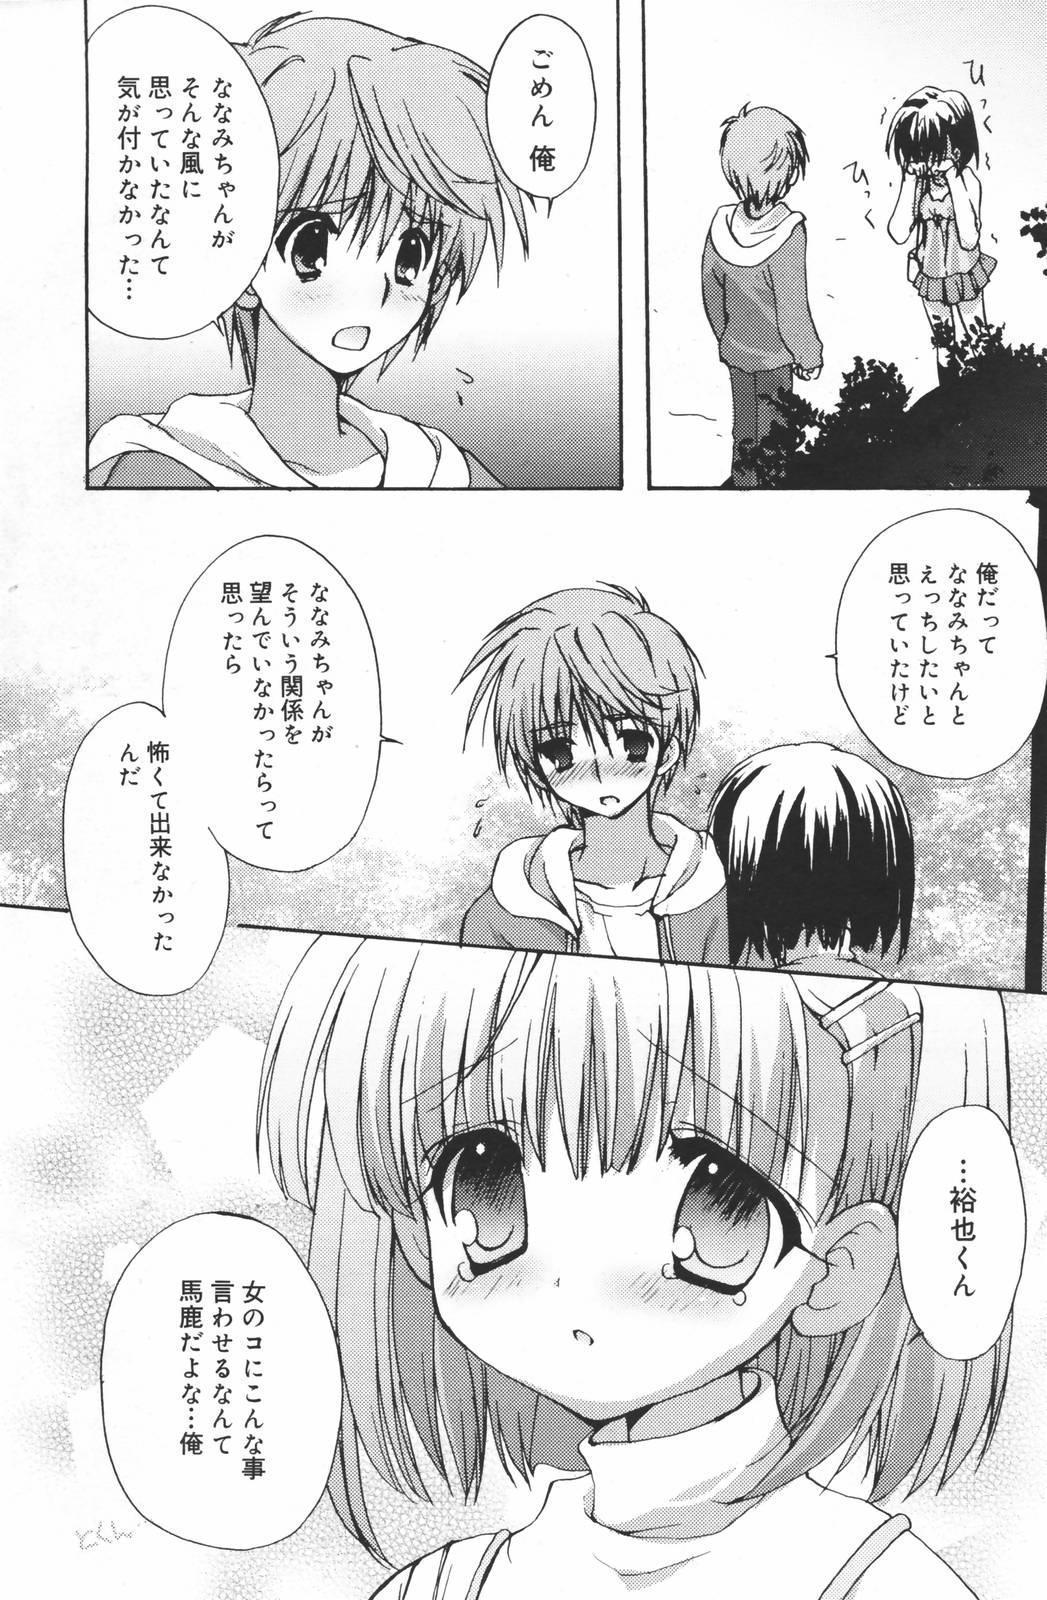 Manga Bangaichi 2007-03 83